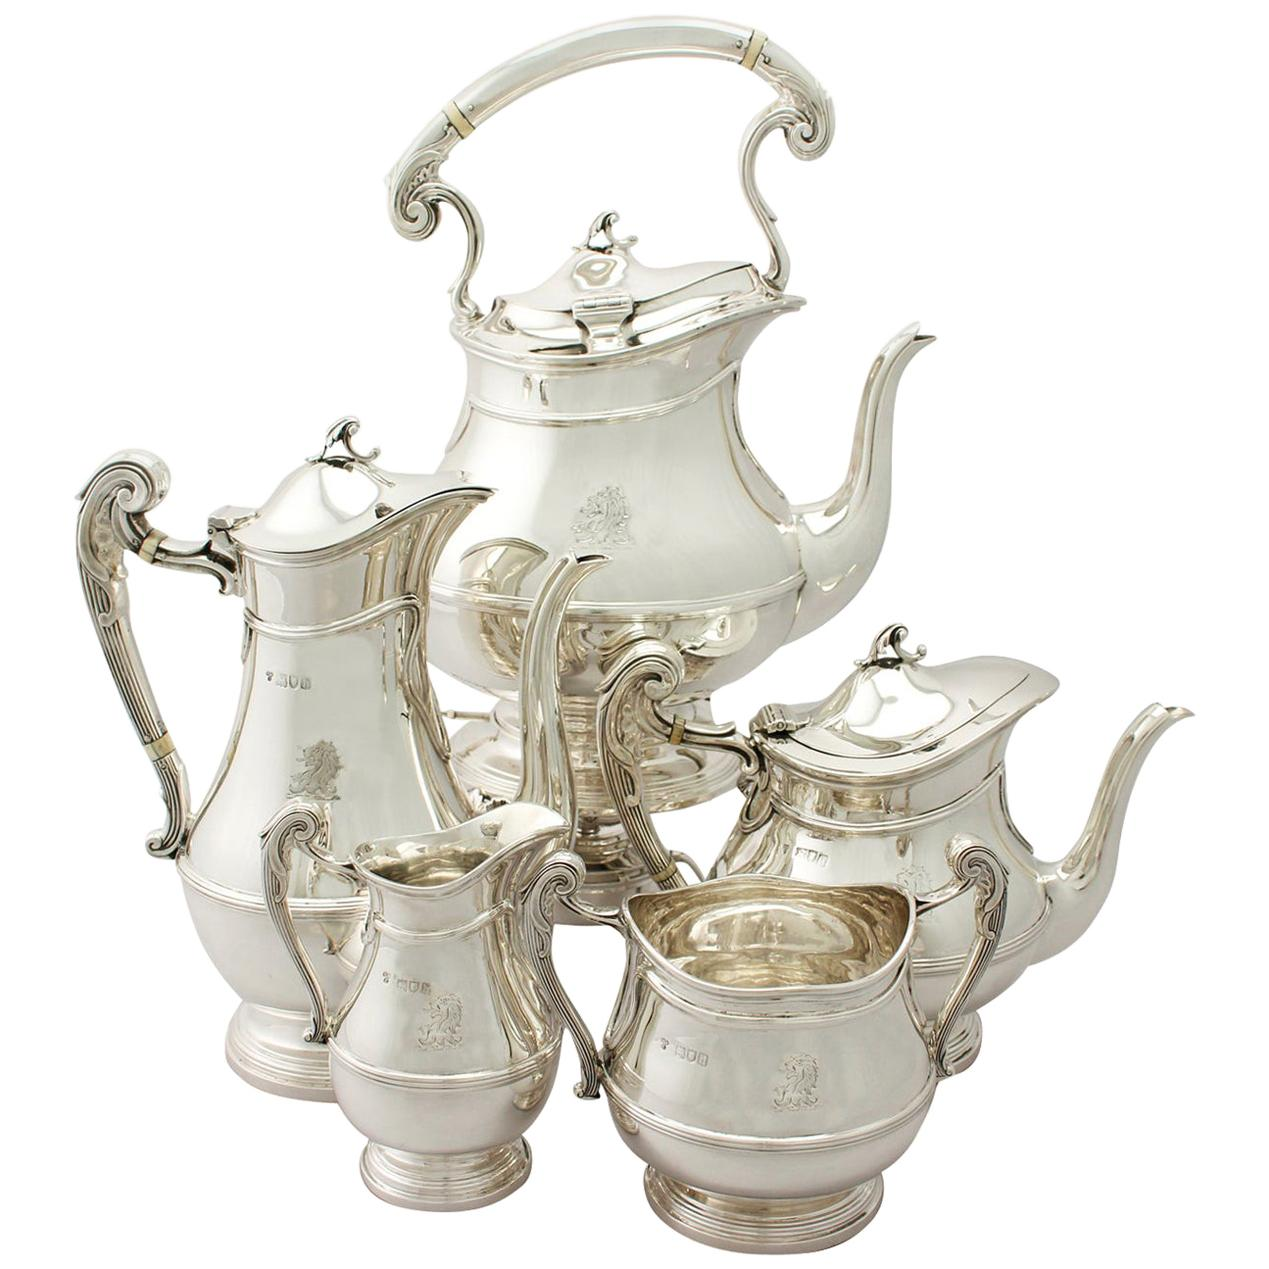 Antique Art Nouveau Style Sterling Silver Five-Piece Tea and Coffee Service